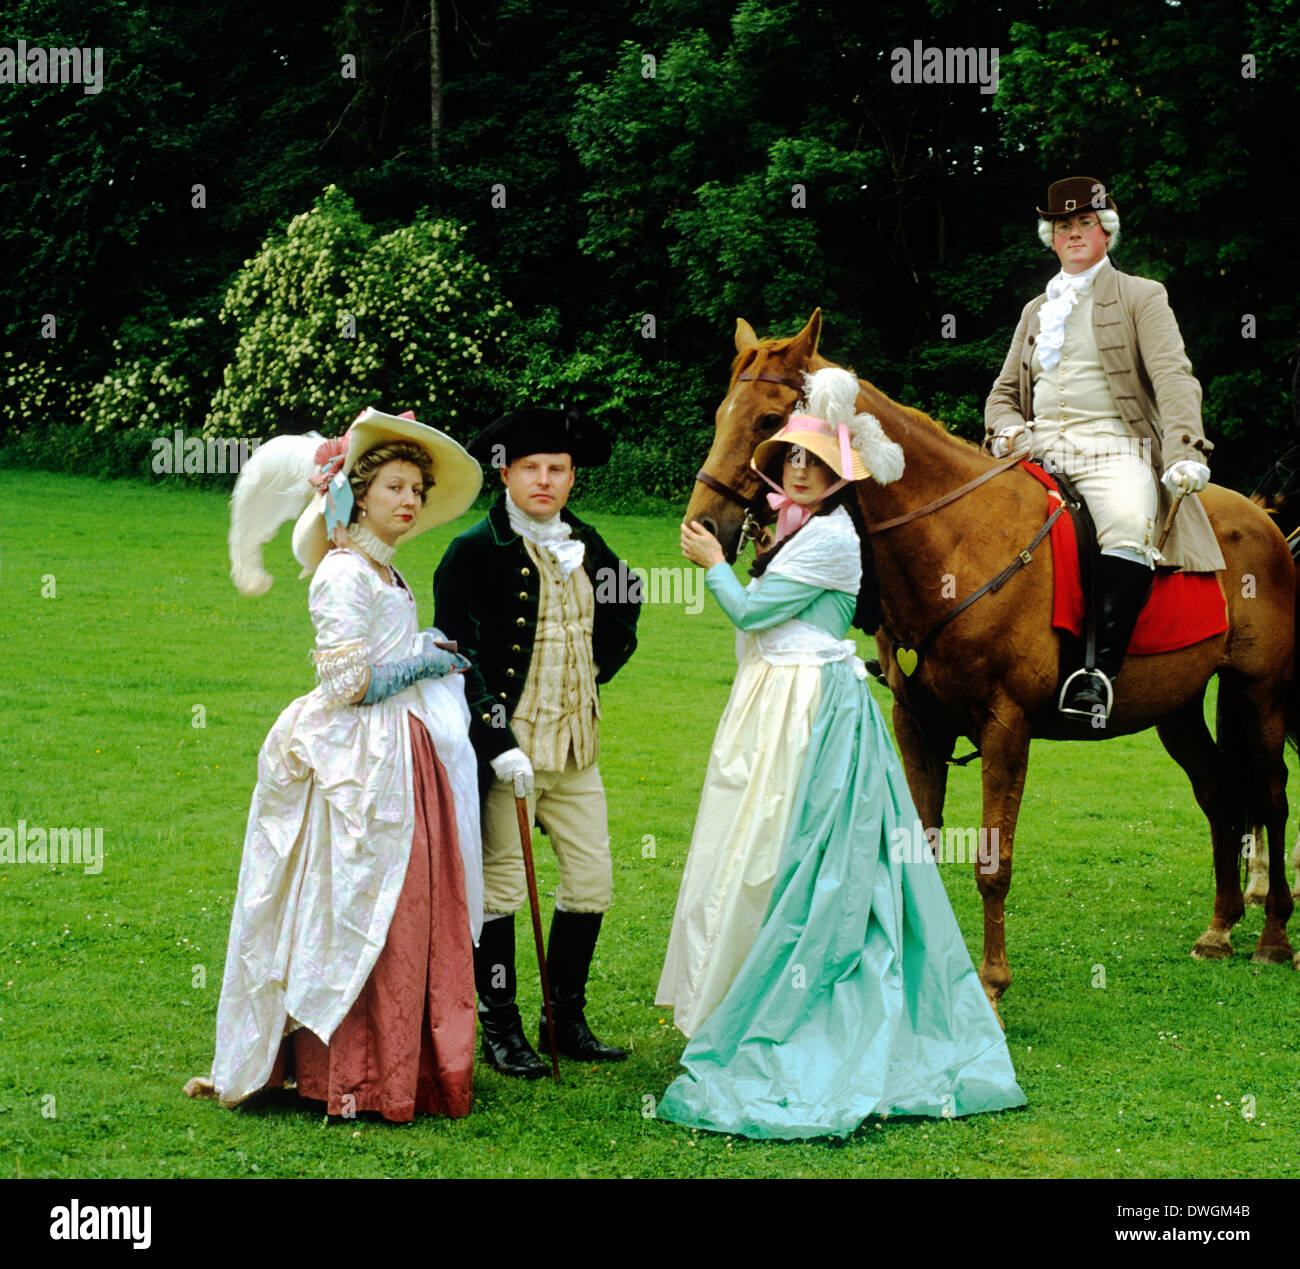 English 18th century Gentry c.1780 in parkland, Wrest Park Bedfordshire, historical re-enactment ladies gentlemen horse costume costumes dress fashion fashions England UK - Stock Image